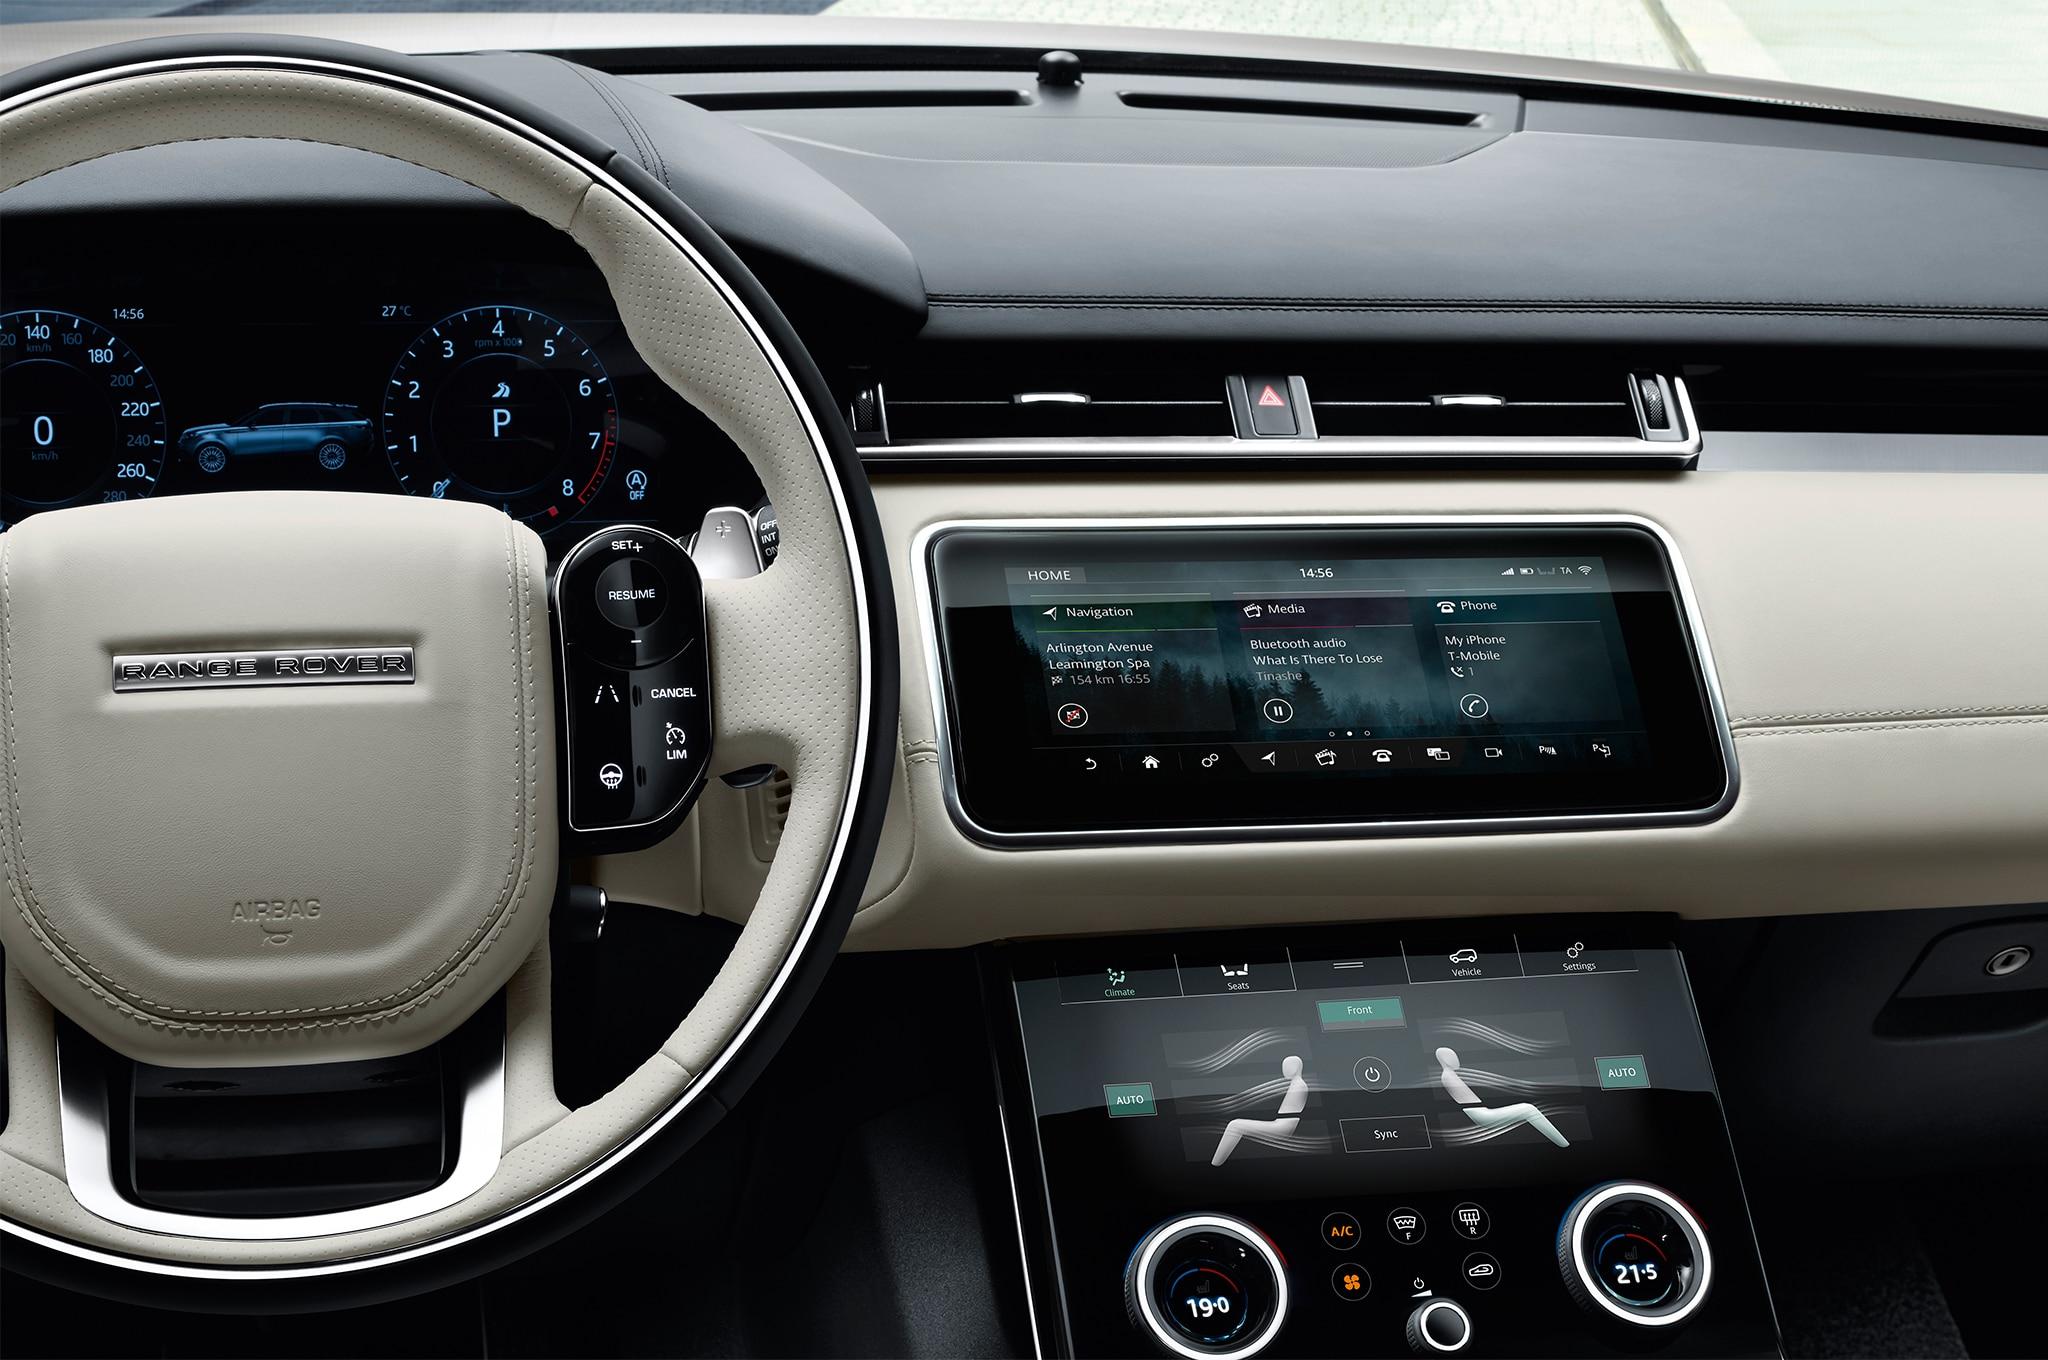 2018 land rover sport interior.  2018 show more and 2018 land rover sport interior 0